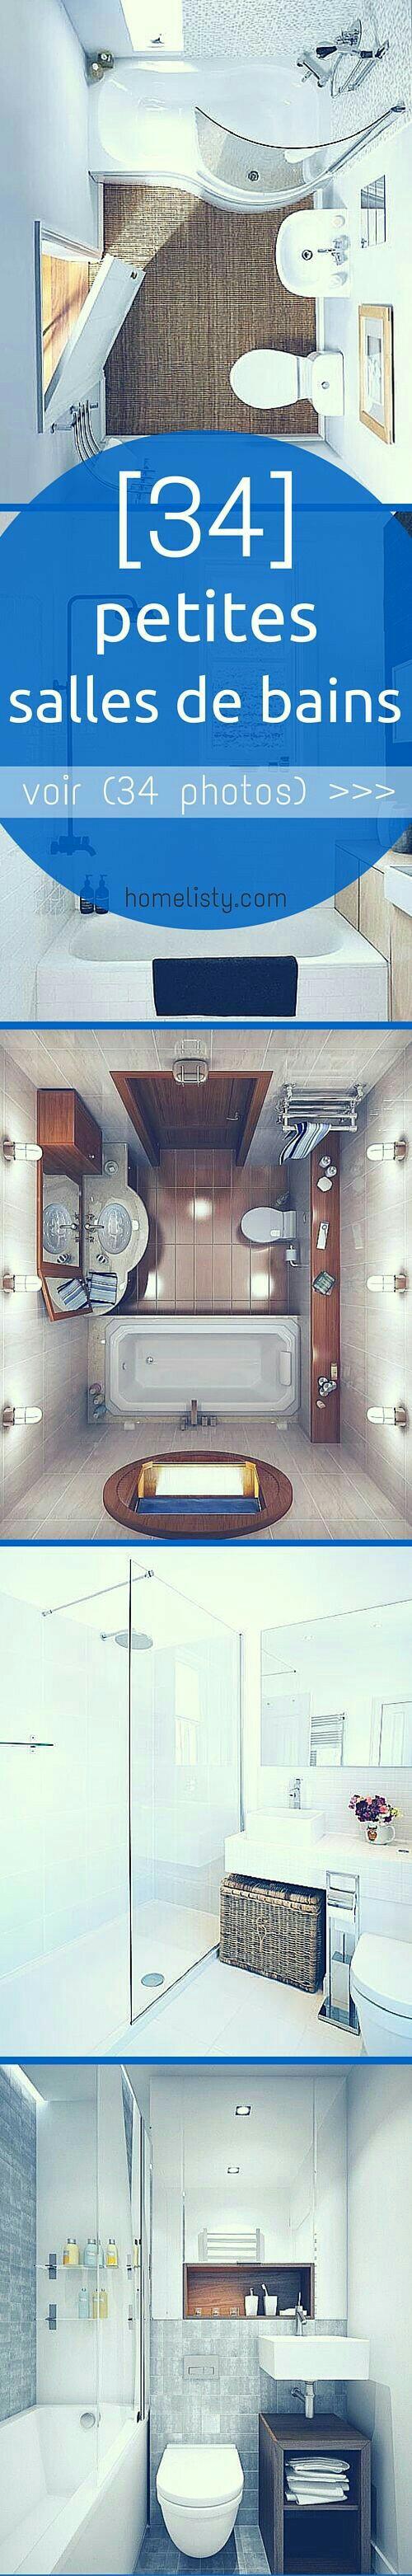 2b5678f0b39e1305ddd7b093d8794daa.jpg (500×3125) | Bathrooms ...